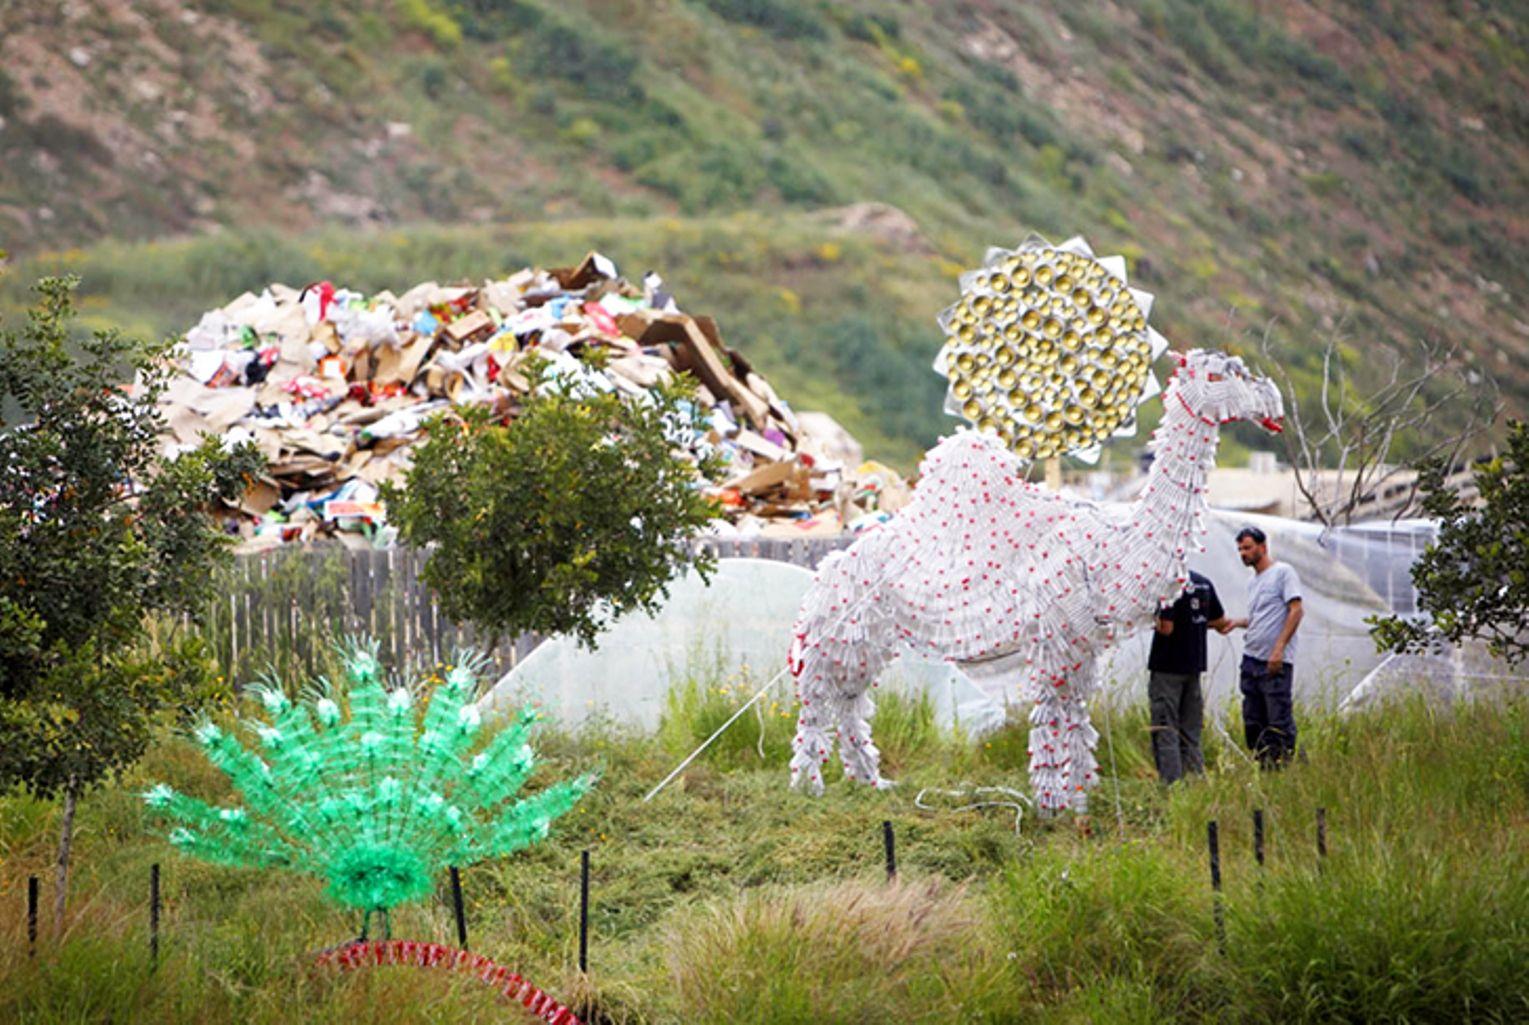 Environmental sculptures made from trash at Hiriya. Photo via Inhabitat.com